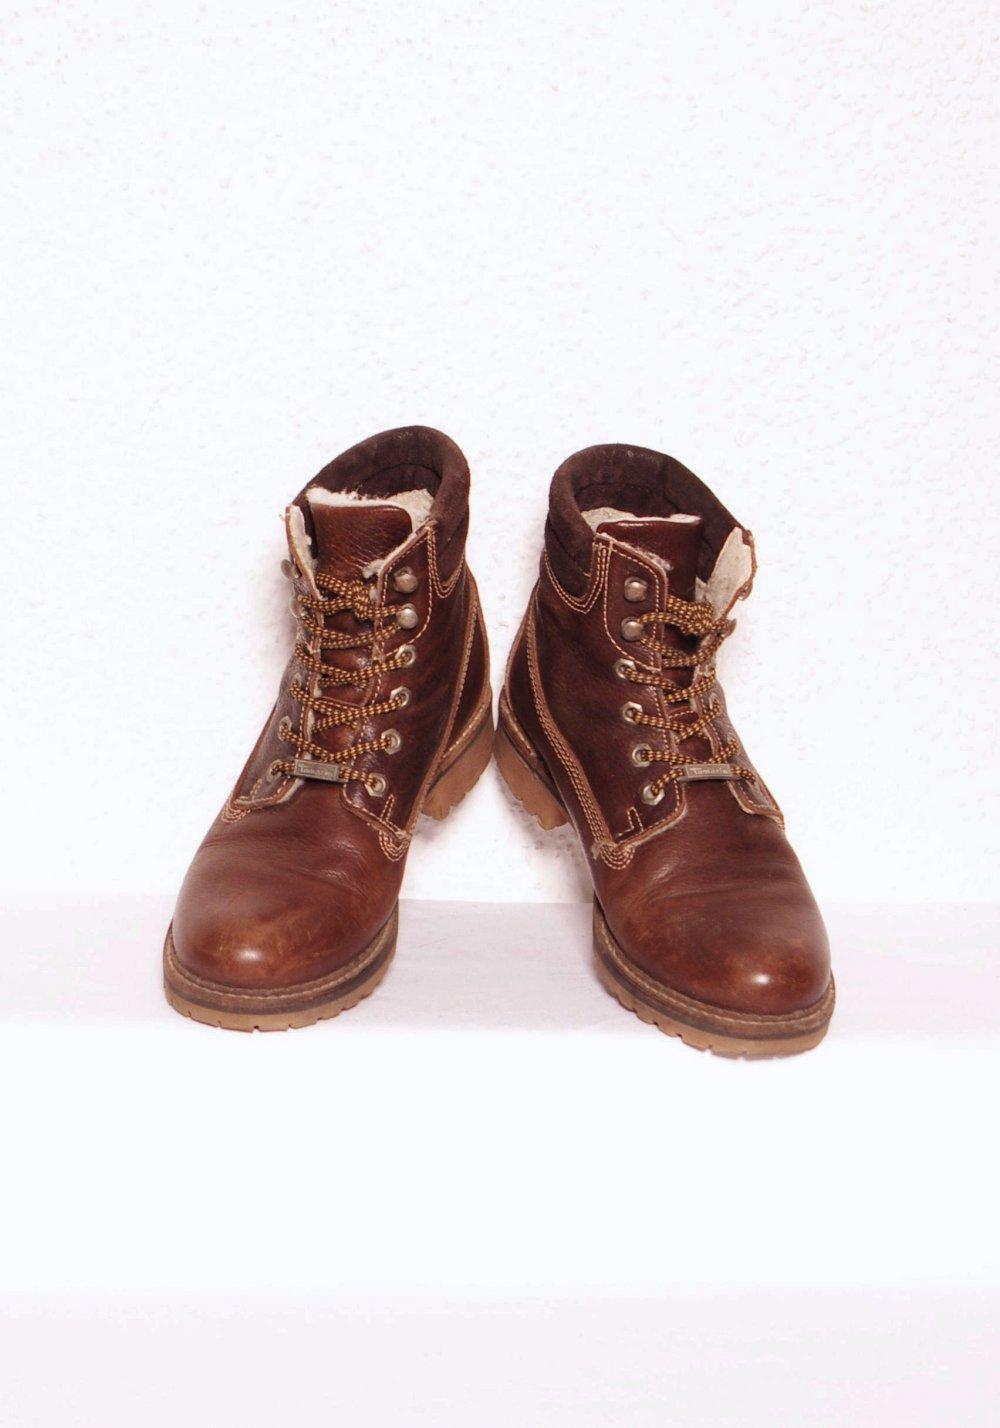 Kurze Tamaris Stiefeletten Gr. 39 Plüschfutter Winter Ankle Boots Combat gefüttert